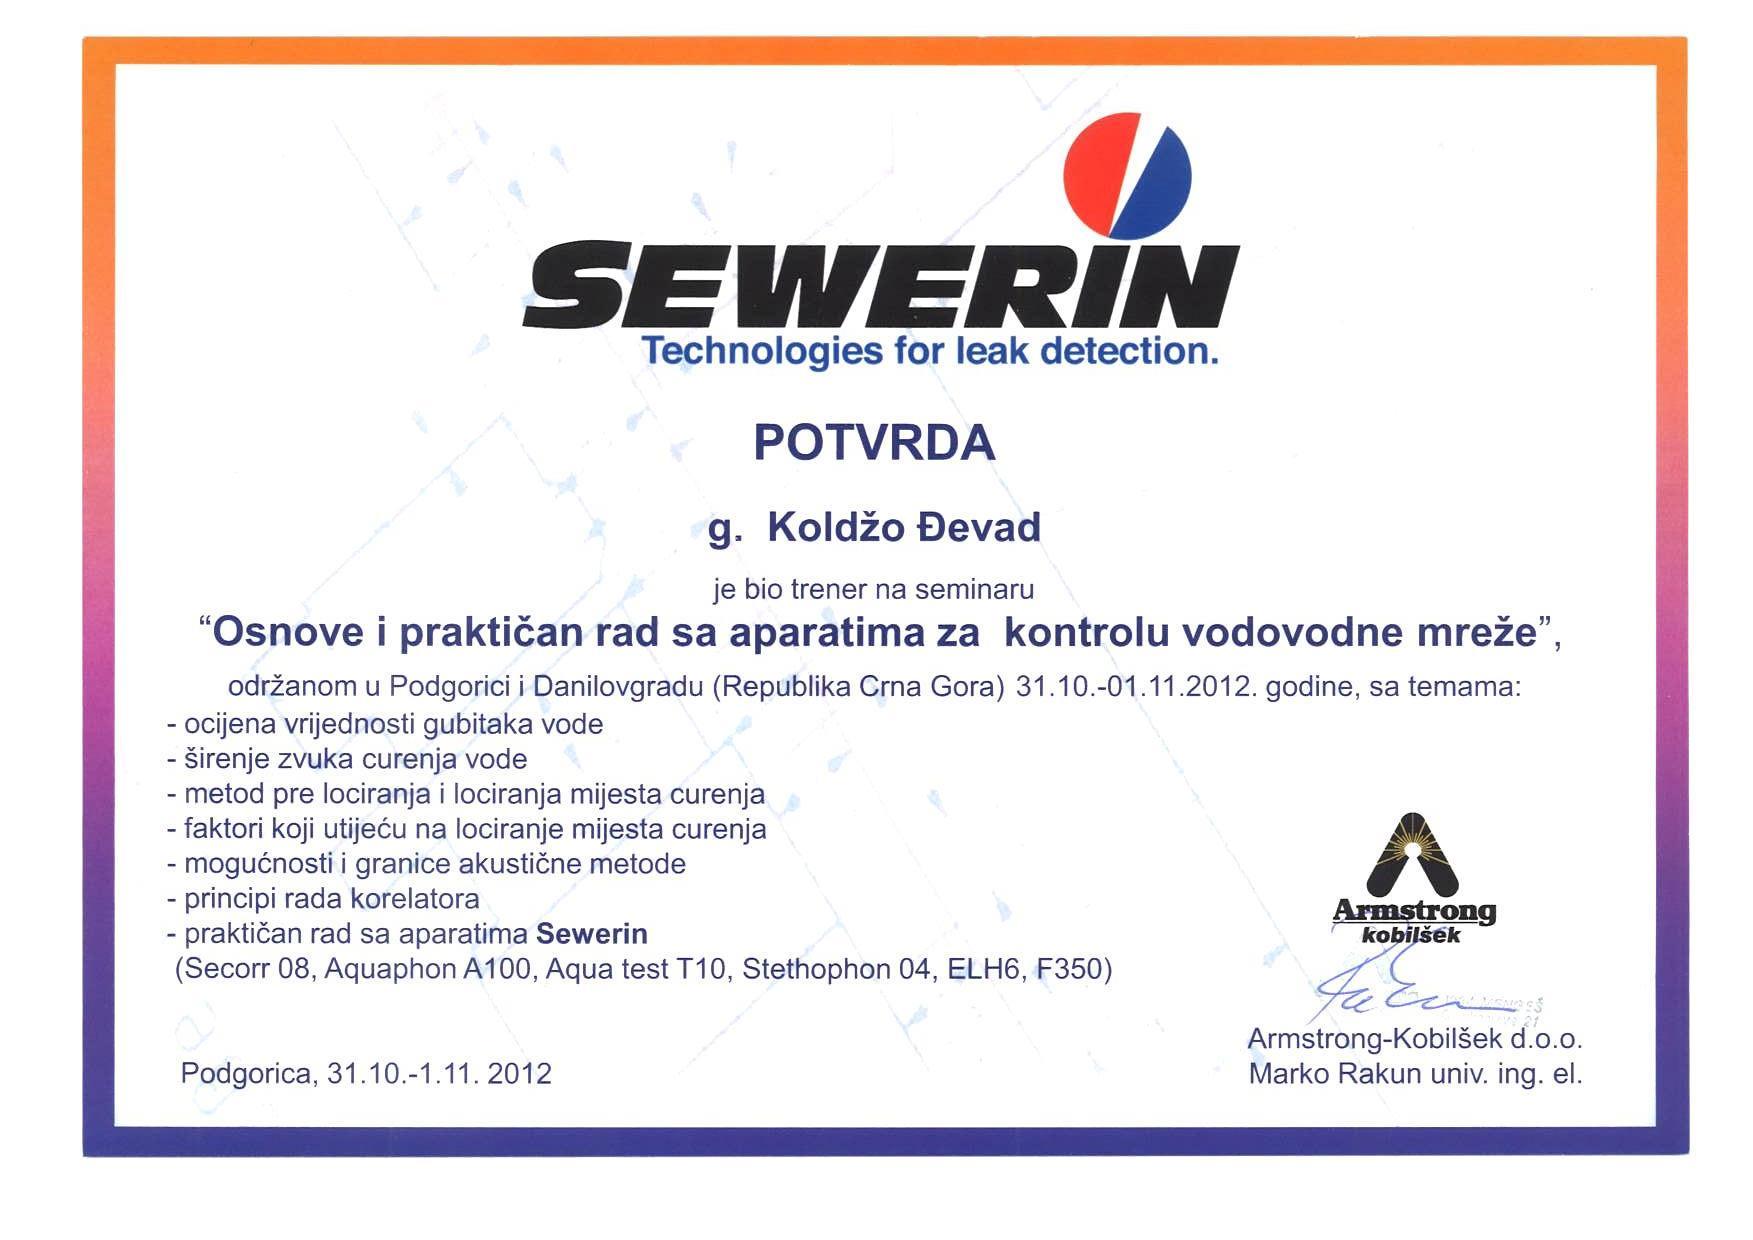 SEWERIN Cetrtificat bosnian